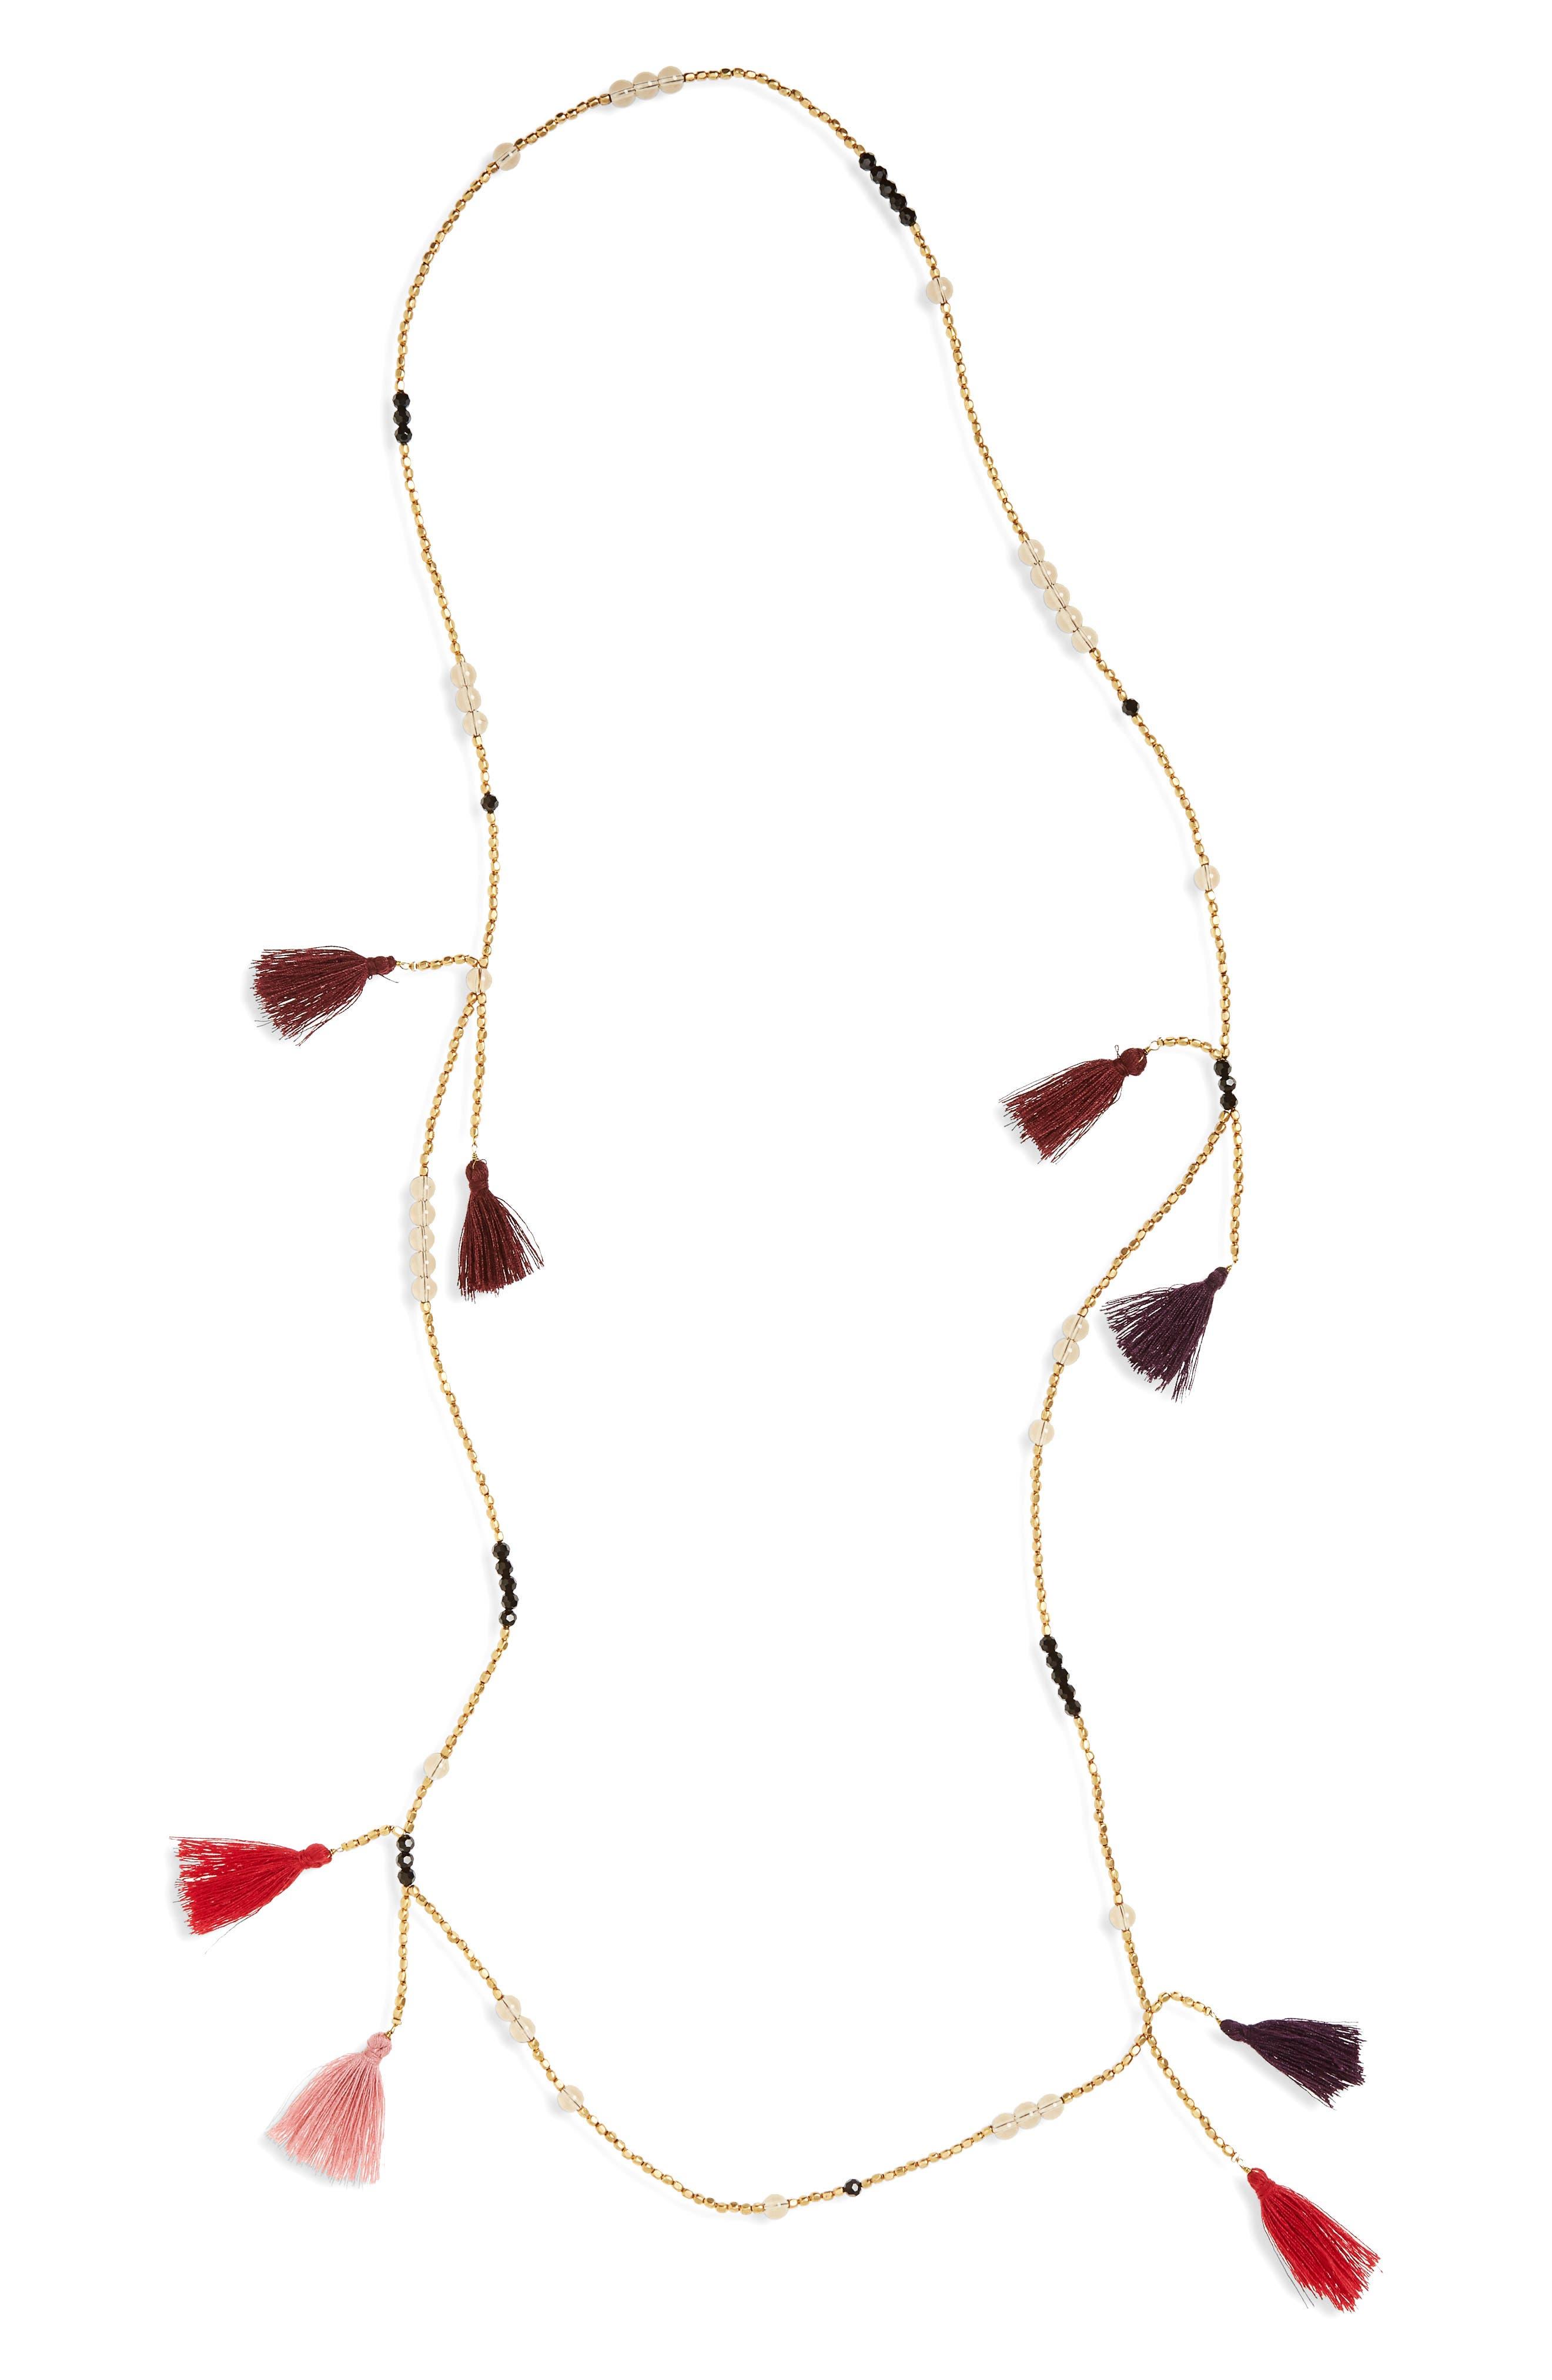 Tassel Bead Necklace,                             Main thumbnail 1, color,                             710